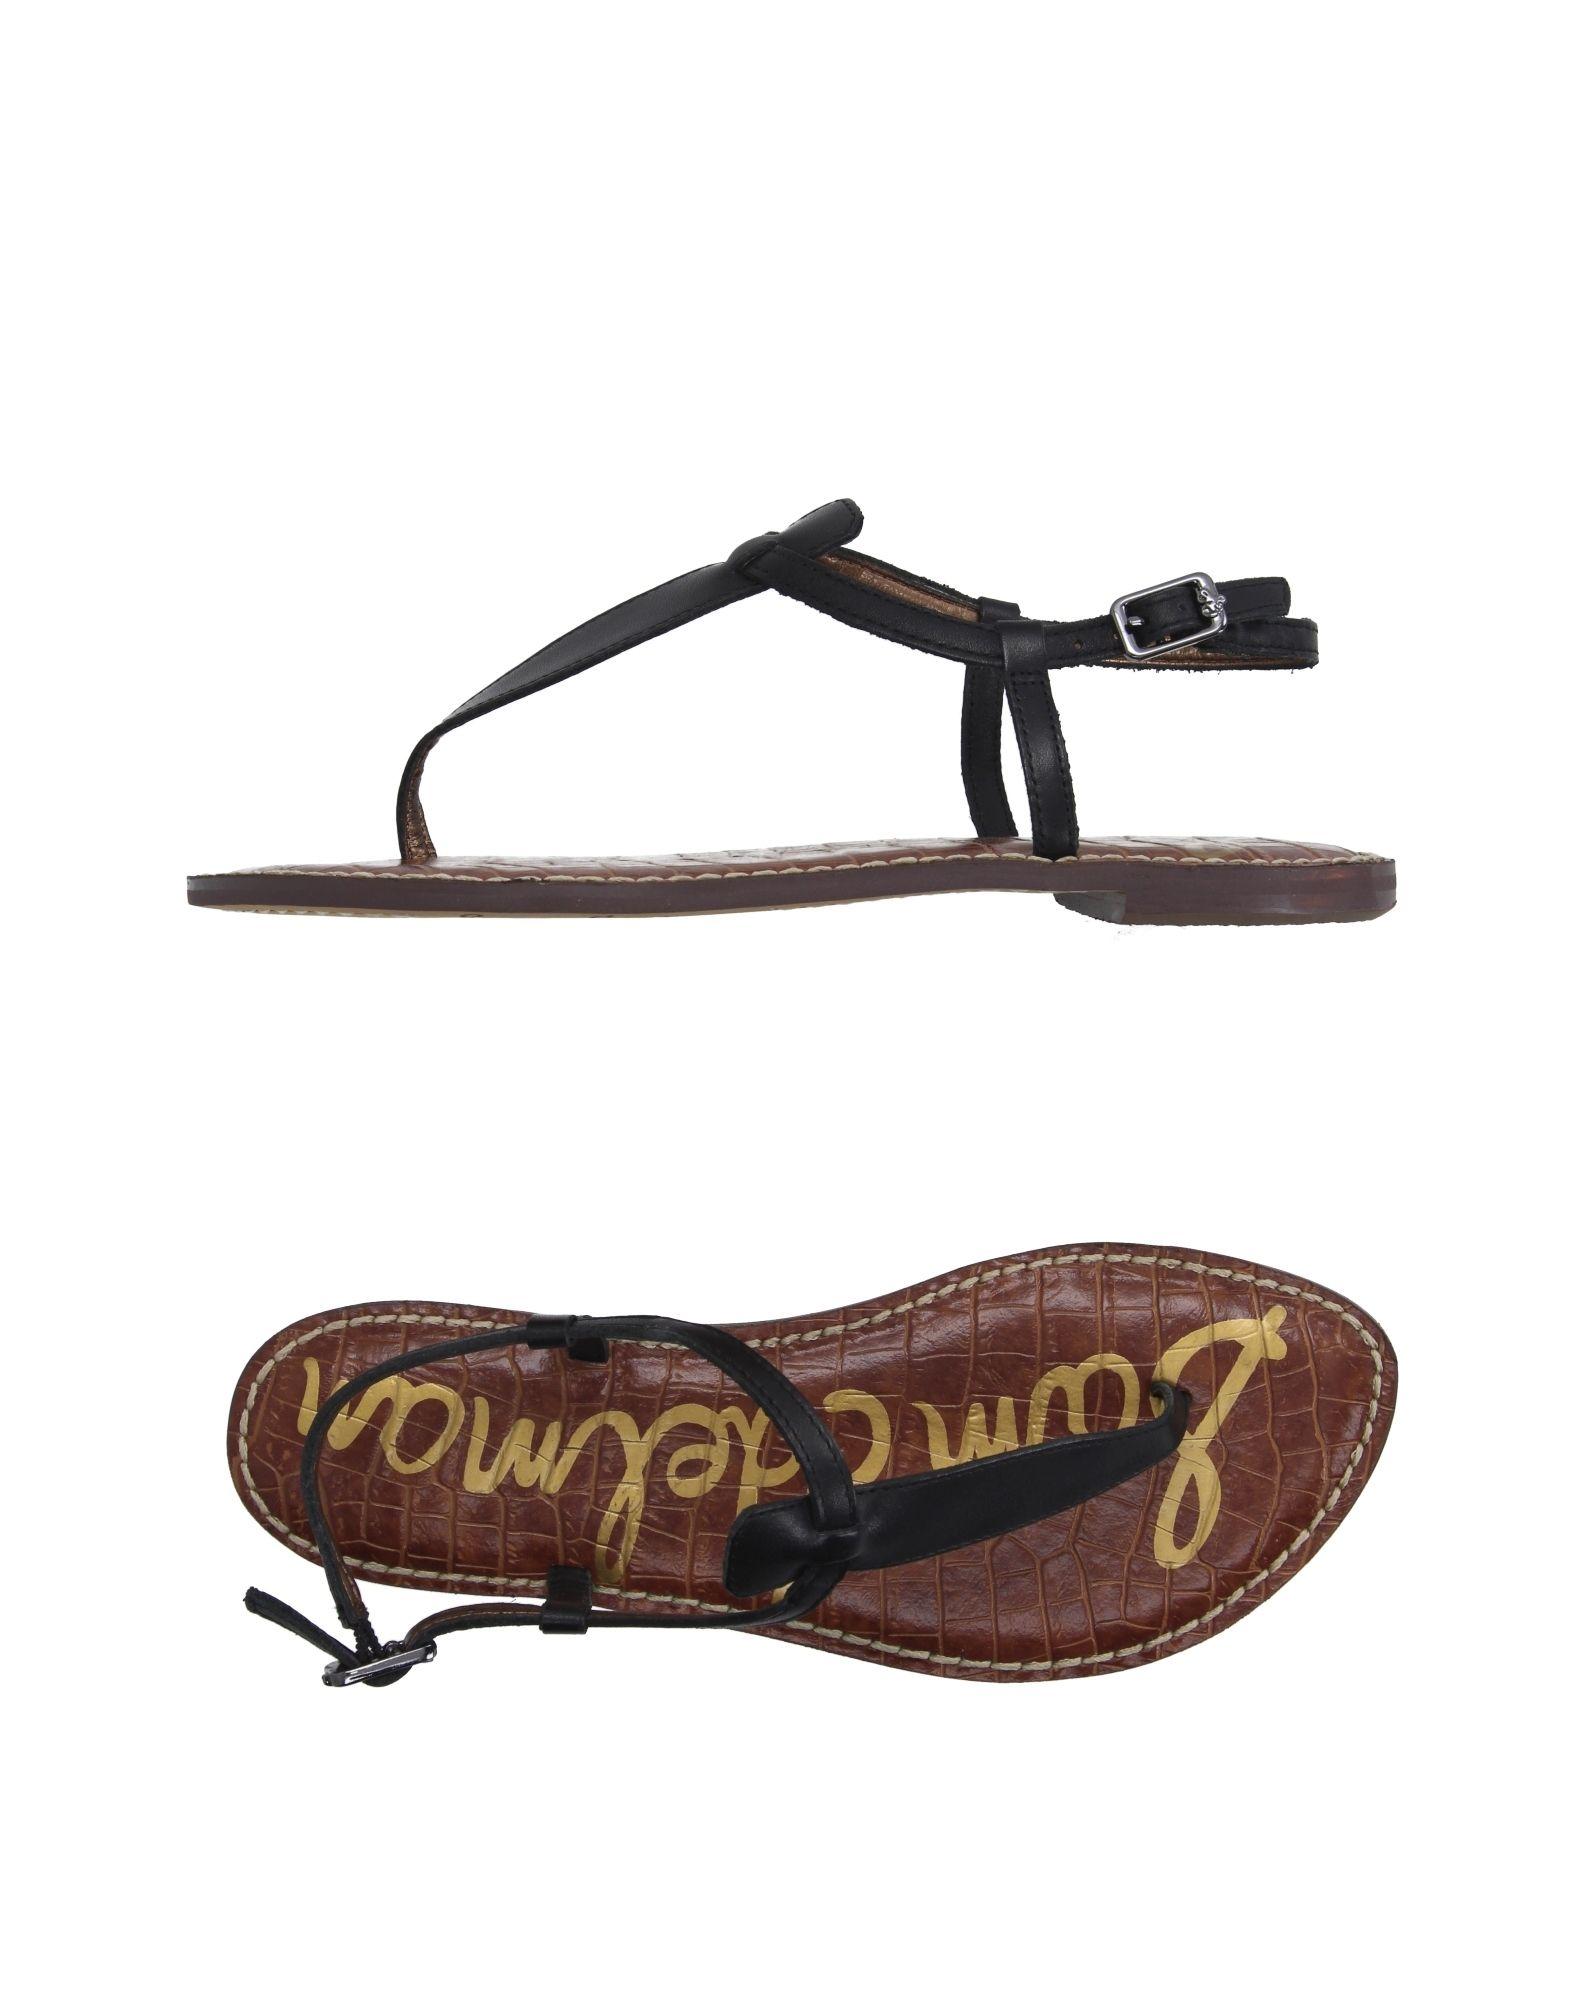 Sam Edelman Dianetten Damen  Schuhe 44989883FW Gute Qualität beliebte Schuhe  7a0c69